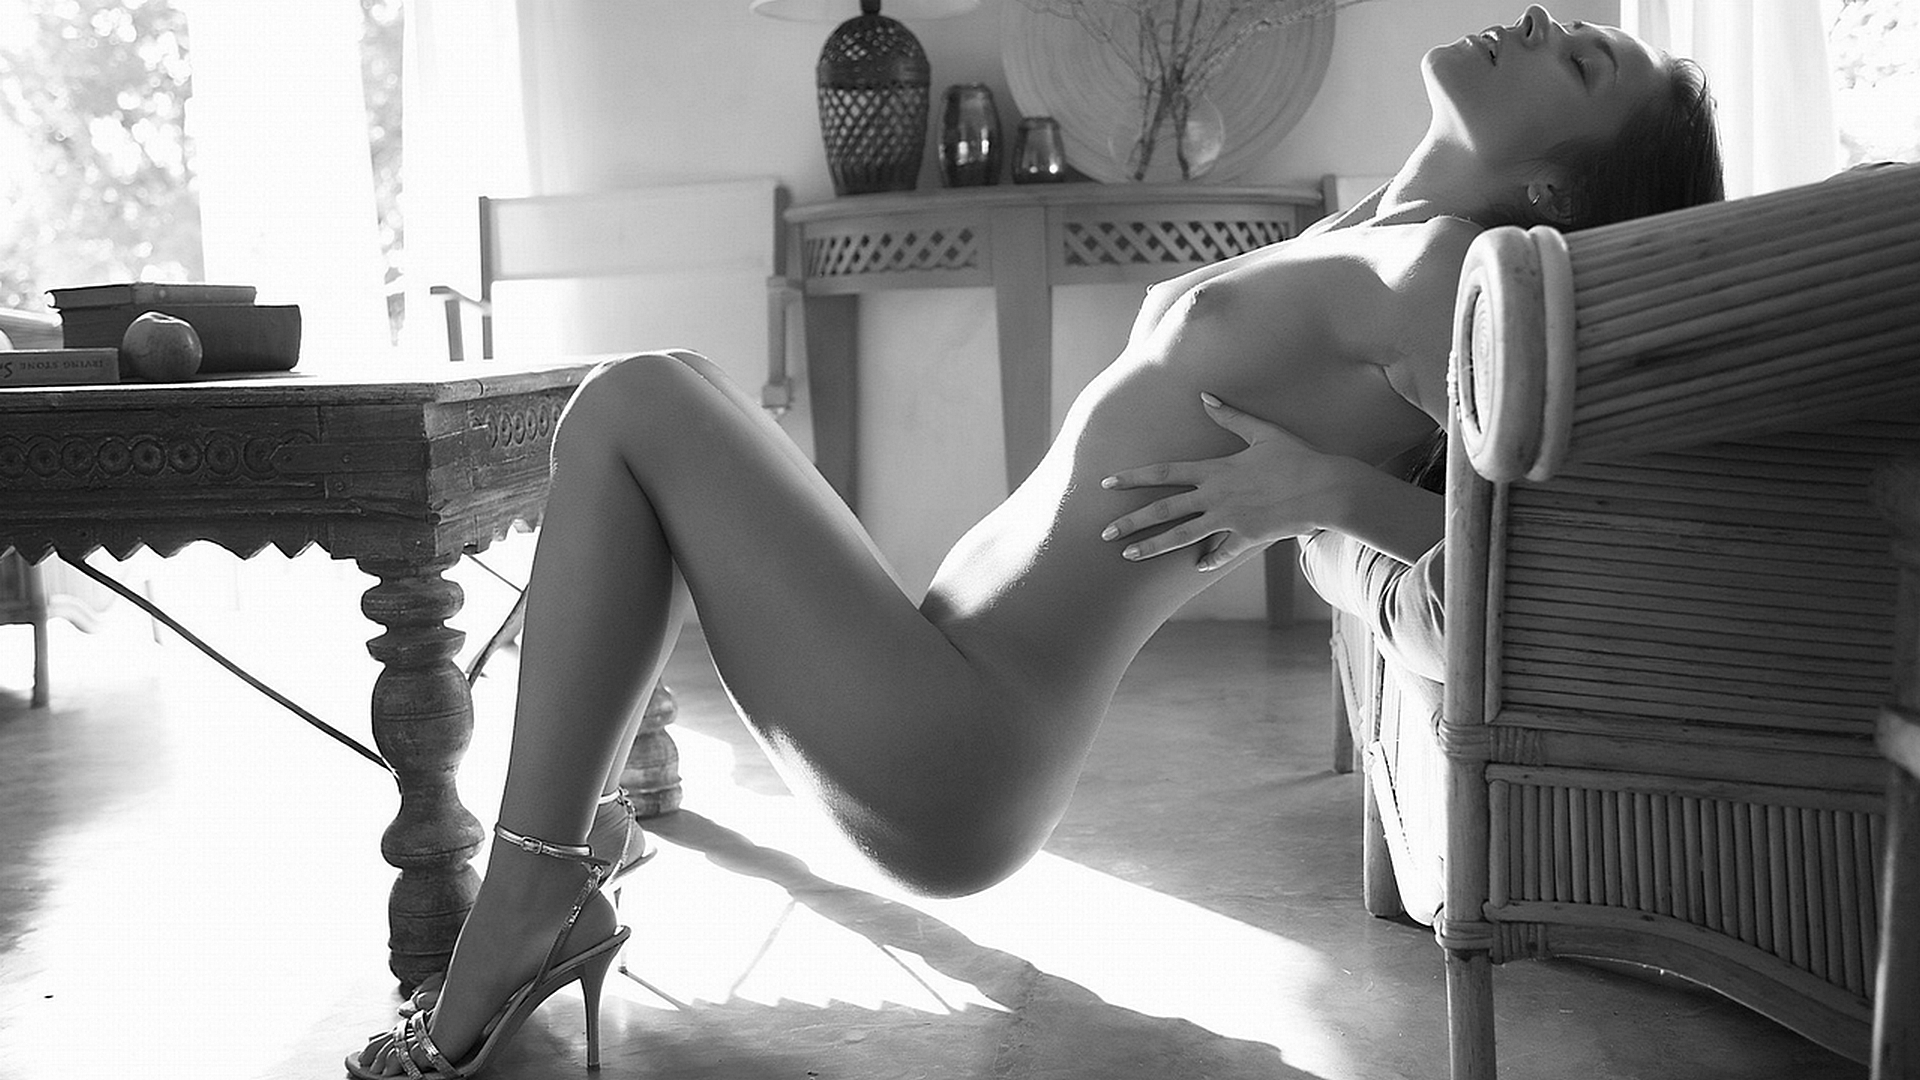 эротика за столом фото фотографии